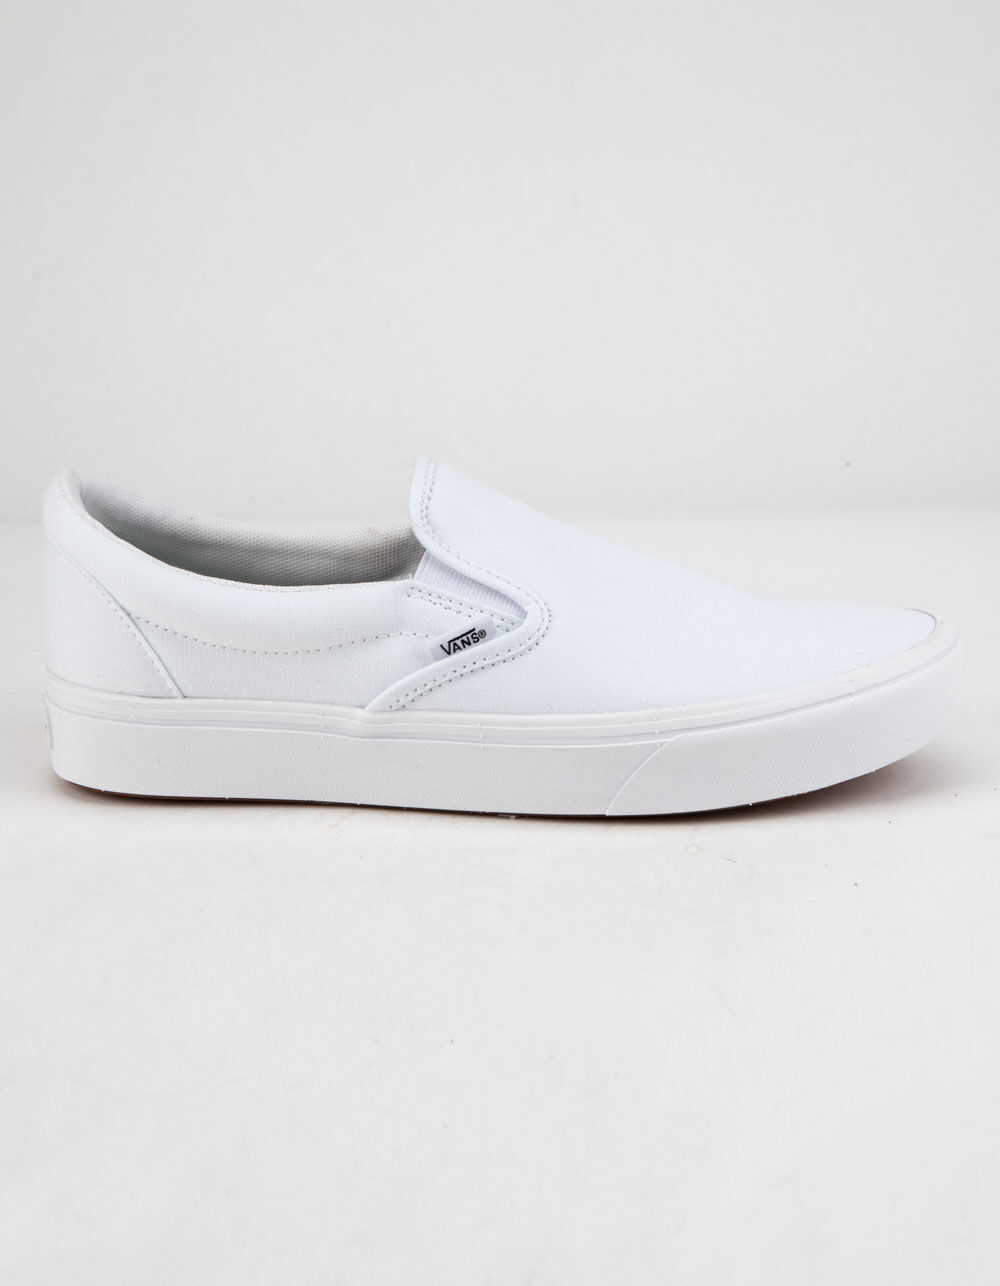 VANS ComfyCush Classic Slip-On True White Shoes